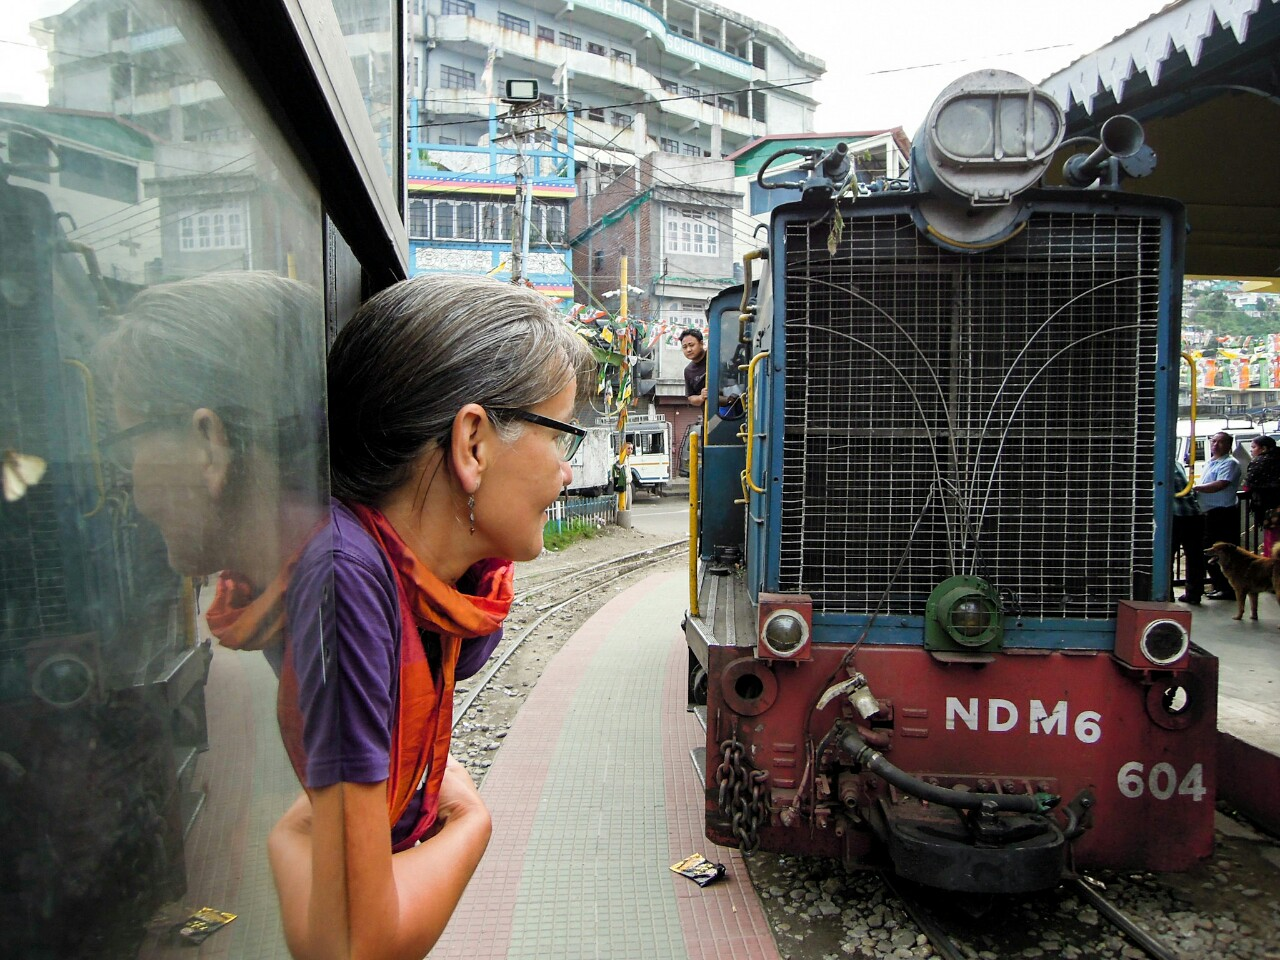 Darjeeling Himalayan Railway (c) Reinhard Gessl organic17.org